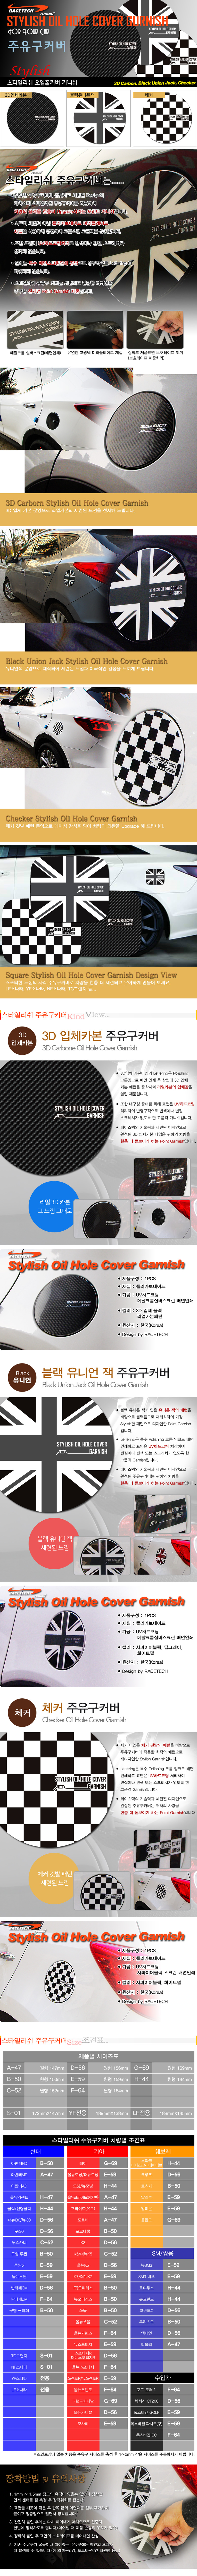 stylish_oil_cover_01.jpg